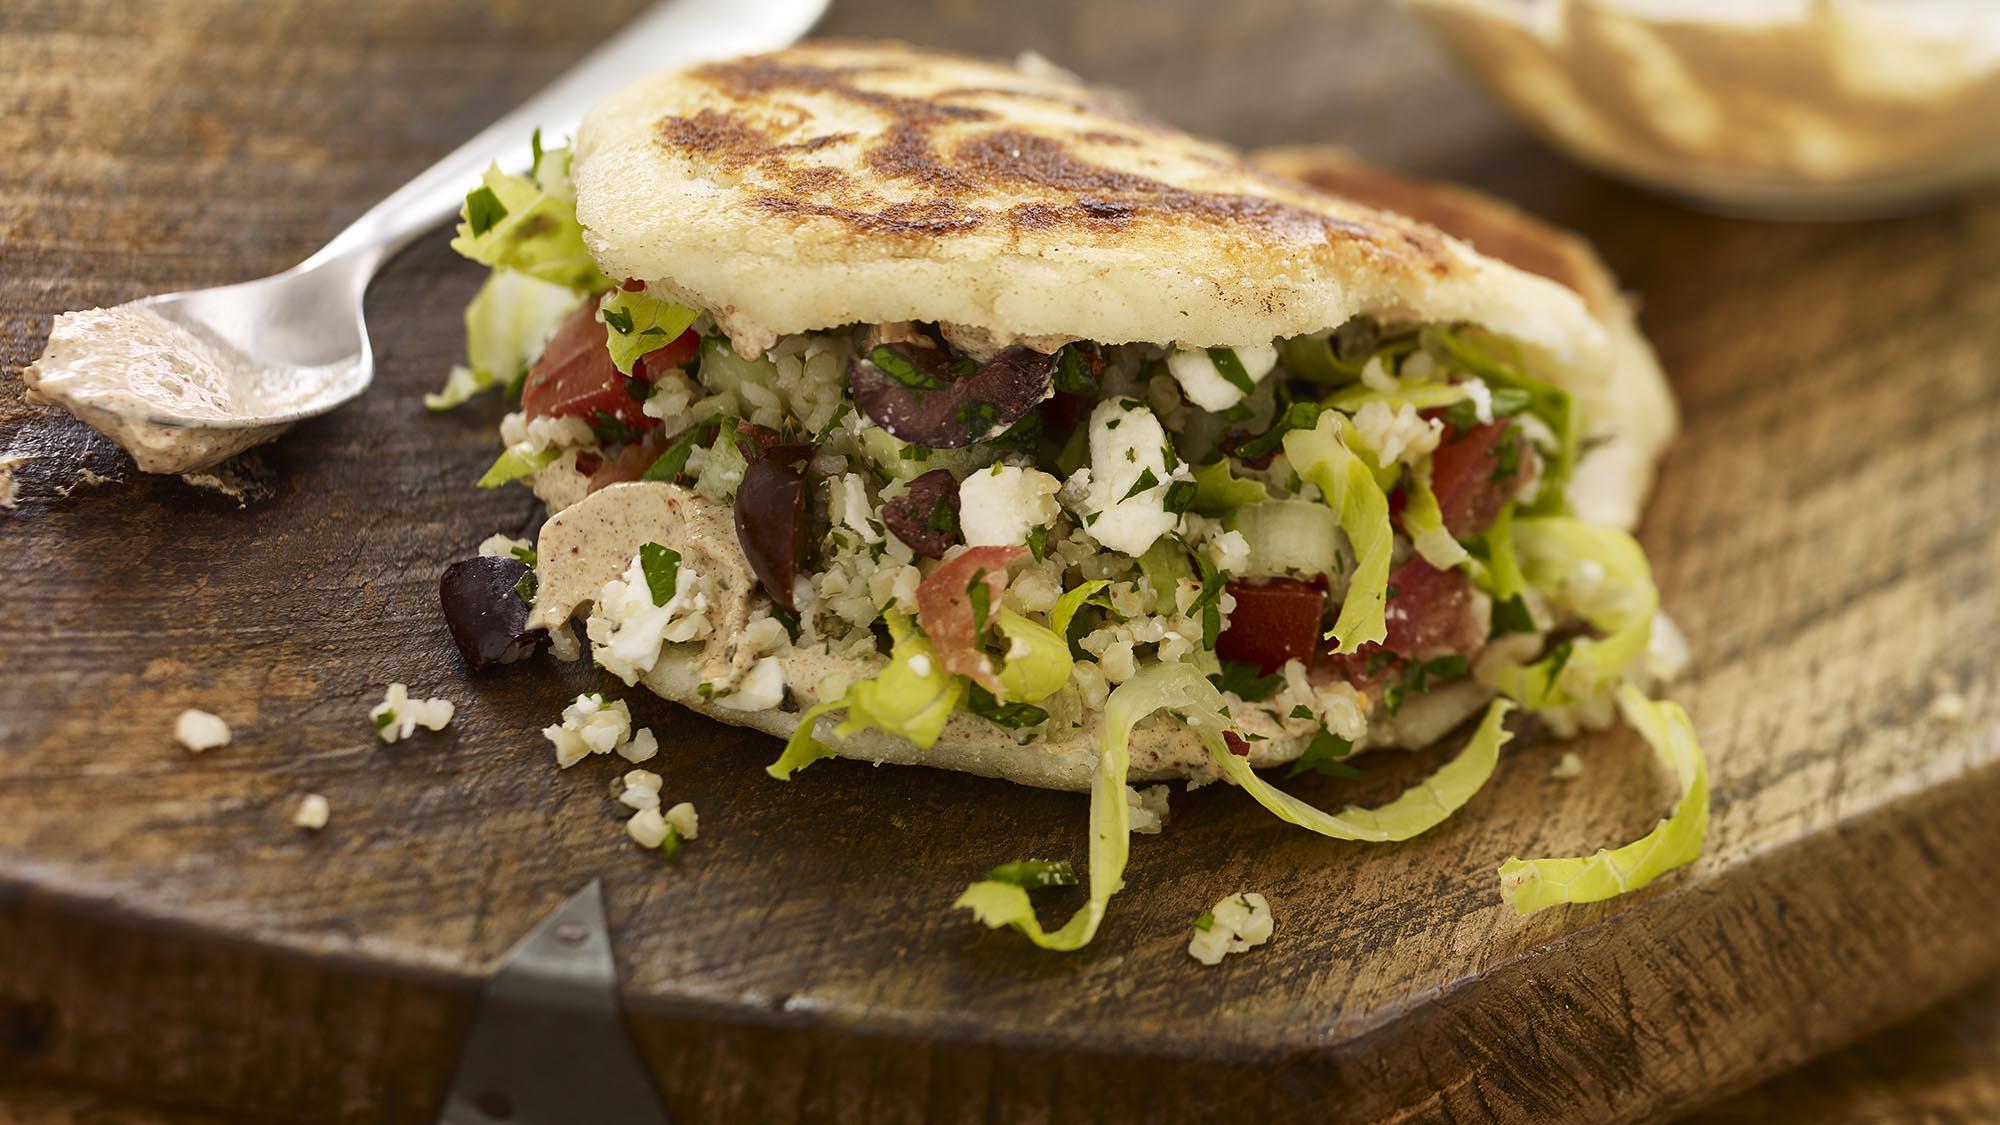 greek_tabbouleh_salad_arepas_with_ancho_yogurt_sauce_2000x1125.jpg